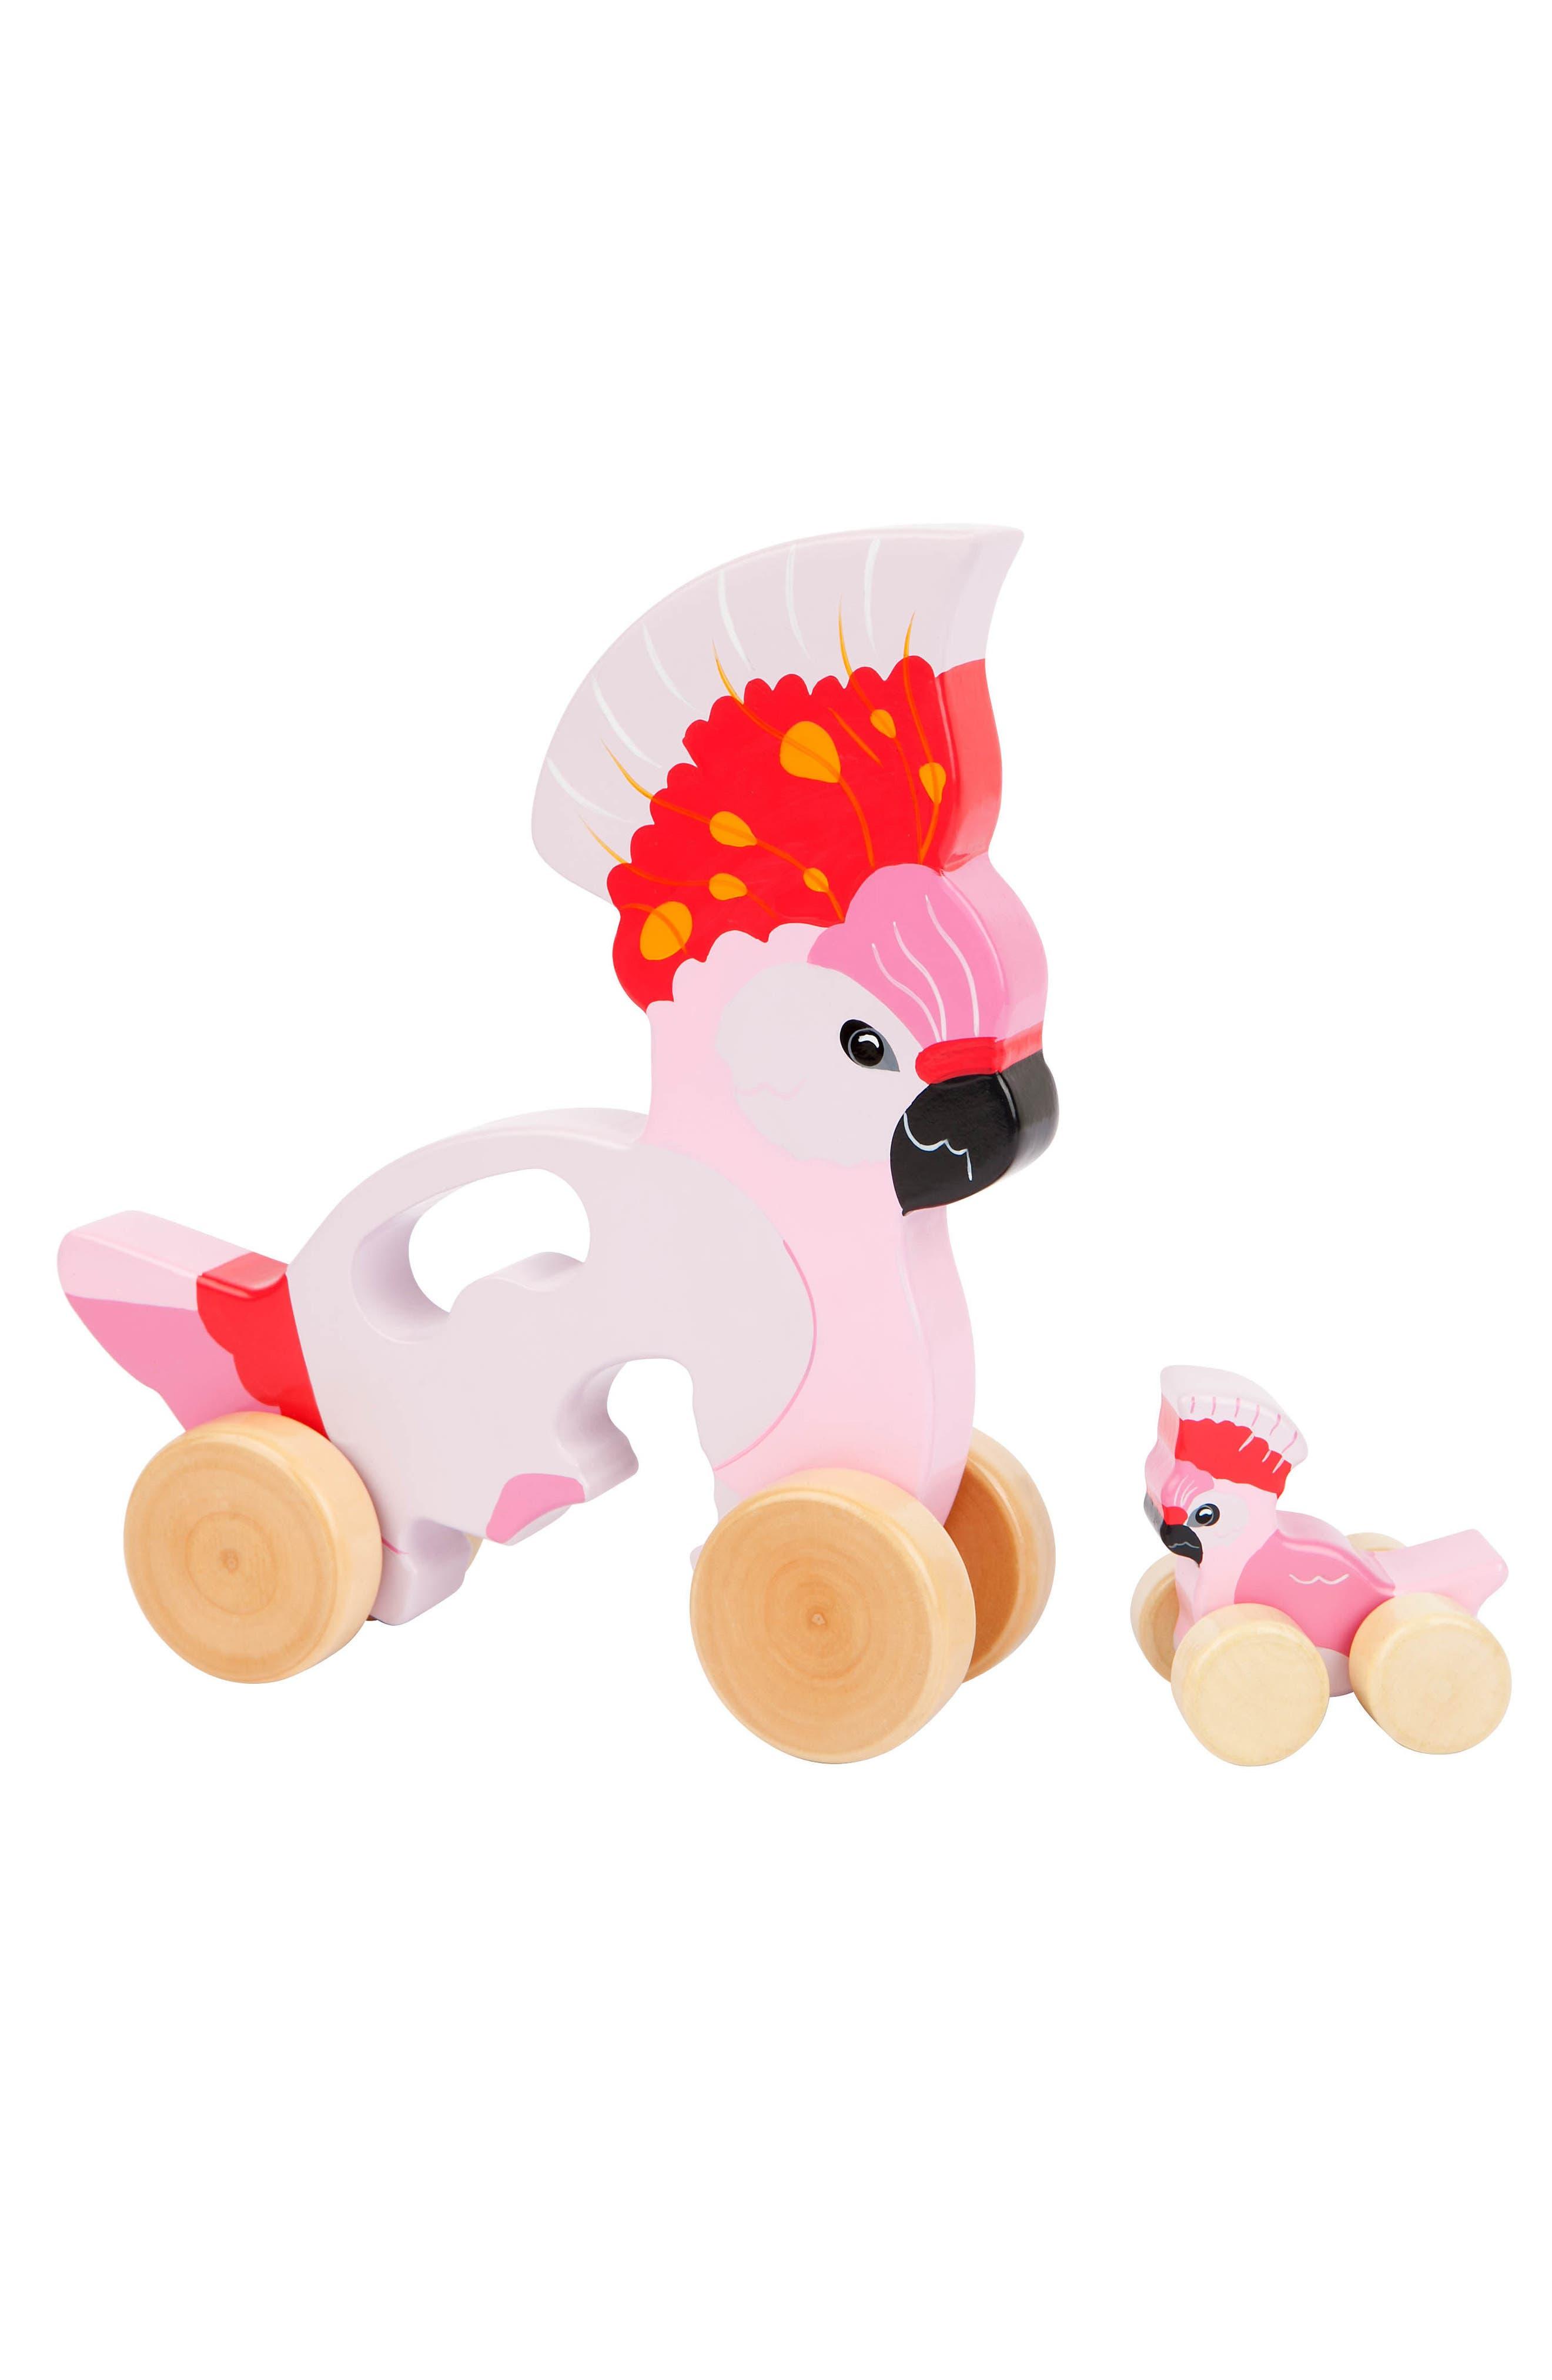 Set of 2 Medium Wheeled Nesting Birds Wooden Toys,                             Alternate thumbnail 2, color,                             Pink